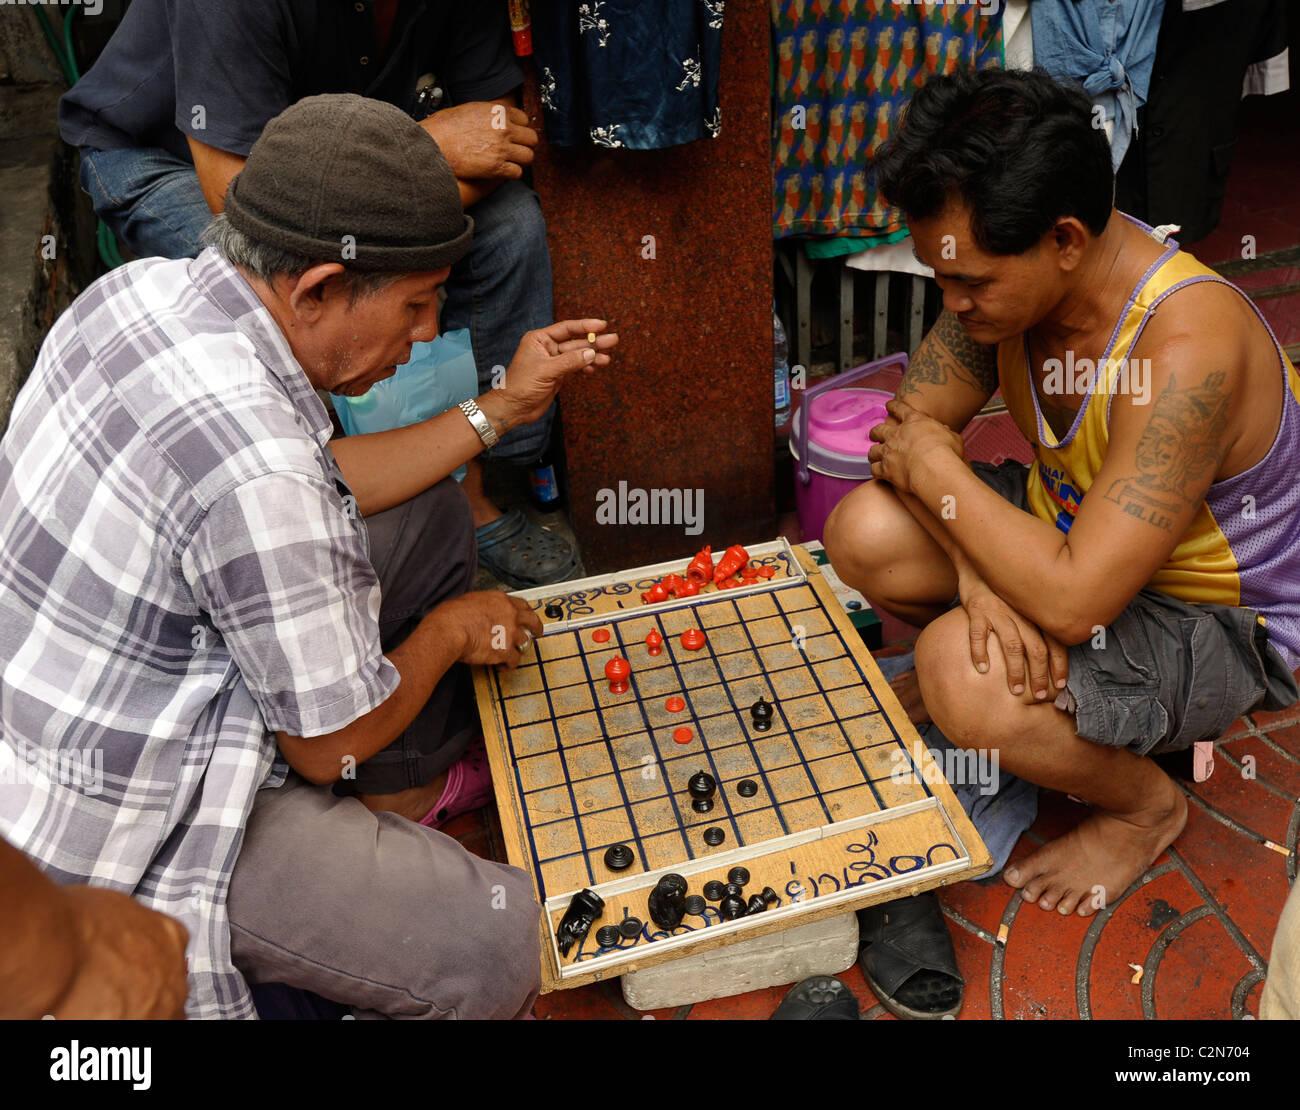 thai chinese men playing chinese checkers (draughts), Yaowarat Road , chinatown, bangkok, thailand - Stock Image